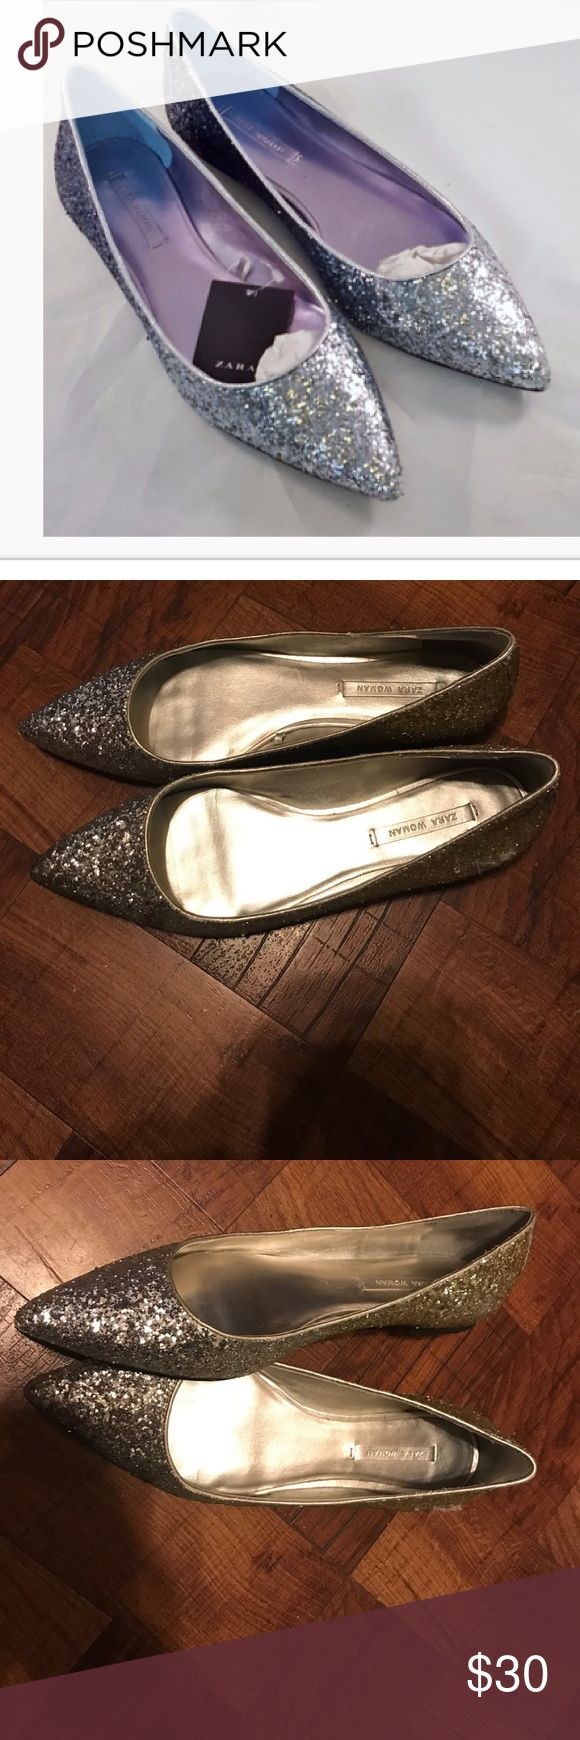 Zara flats Women's Metallic Glitter Pointed Ballet Flats Glitter Pointed Ballet Flats Zara Shoes Flats & Loafers